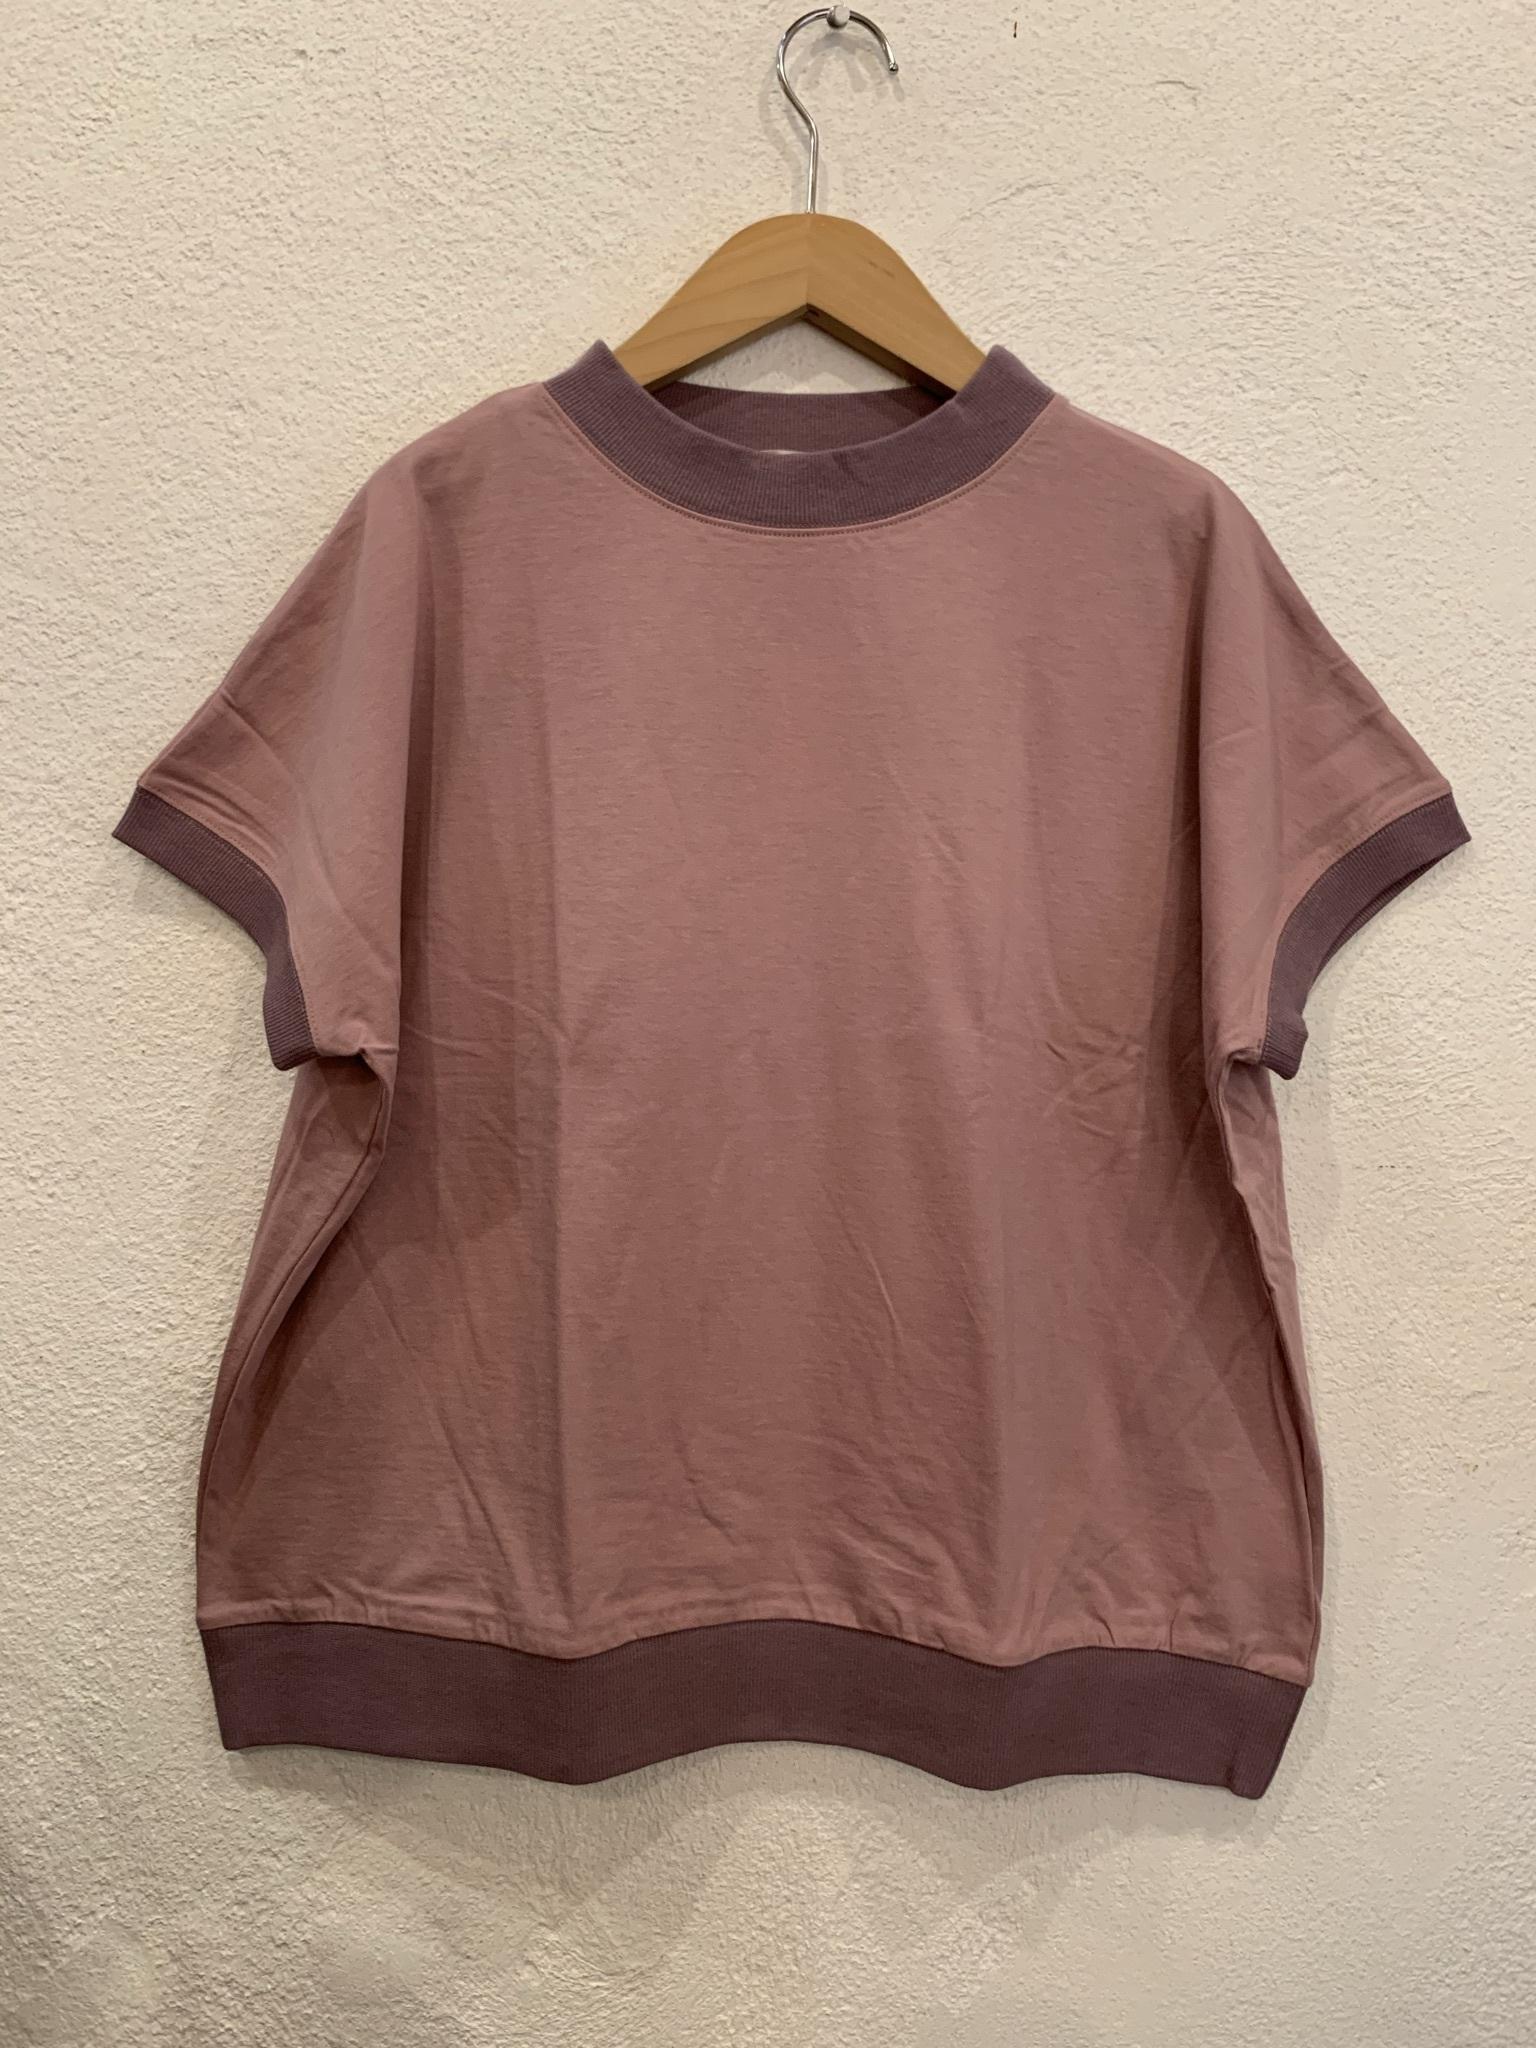 nachukara/リブドッキング半袖Tシャツ ピンク